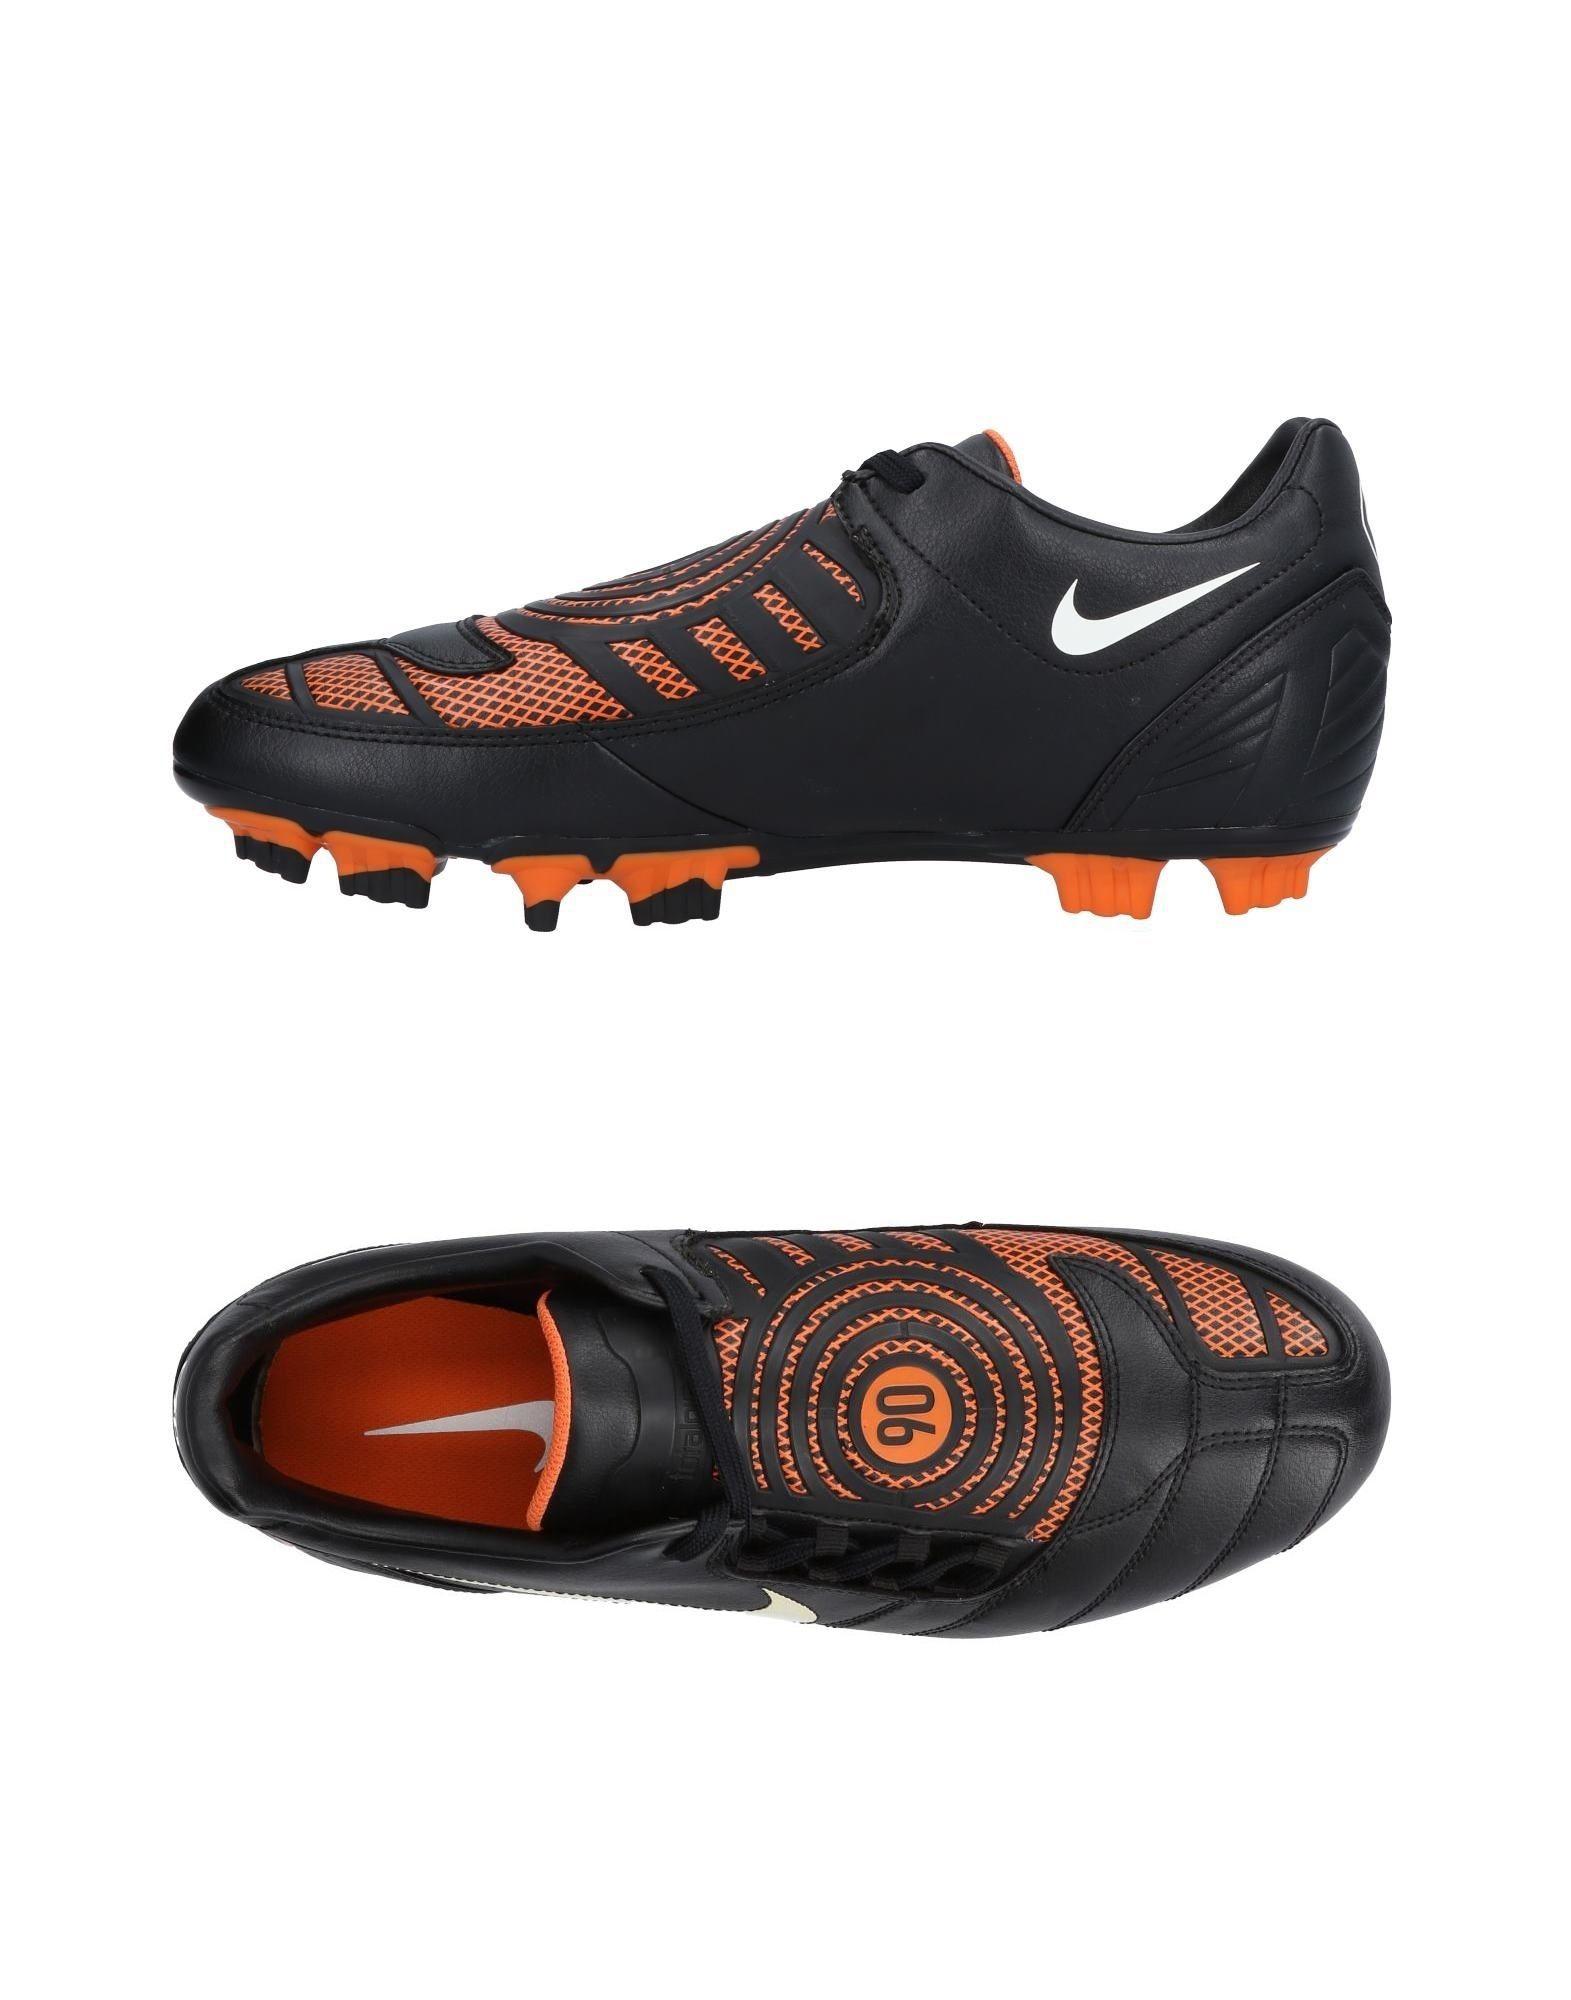 Moda Ginnastica Scarpe da Ginnastica Moda Nike Uomo - 11467068XQ 969104